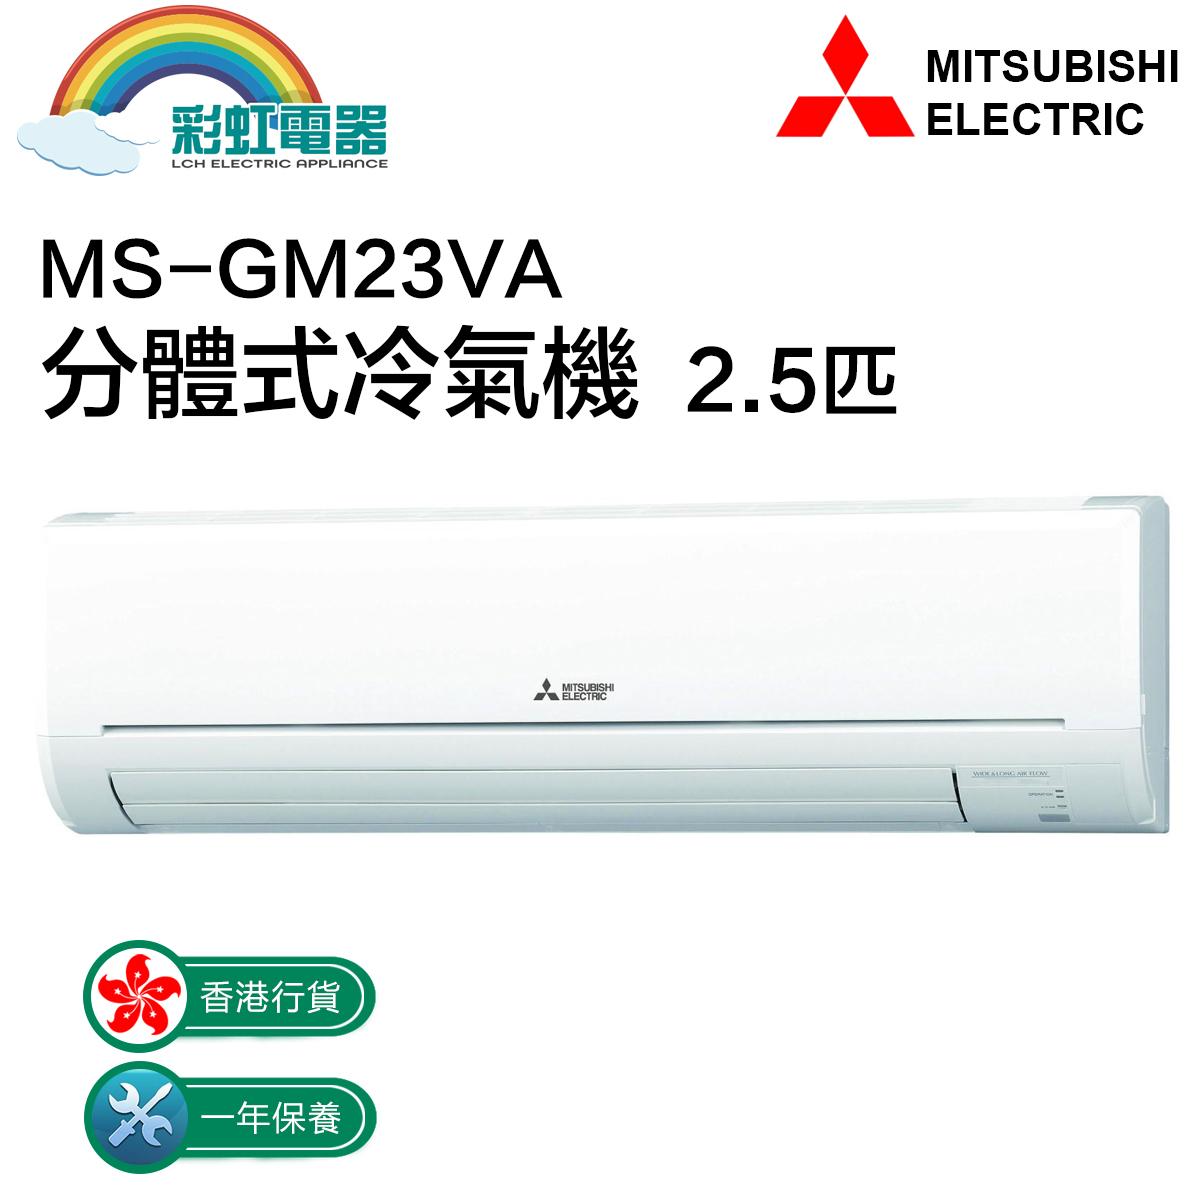 MS-GM23VA 2.5匹 分體式冷氣機